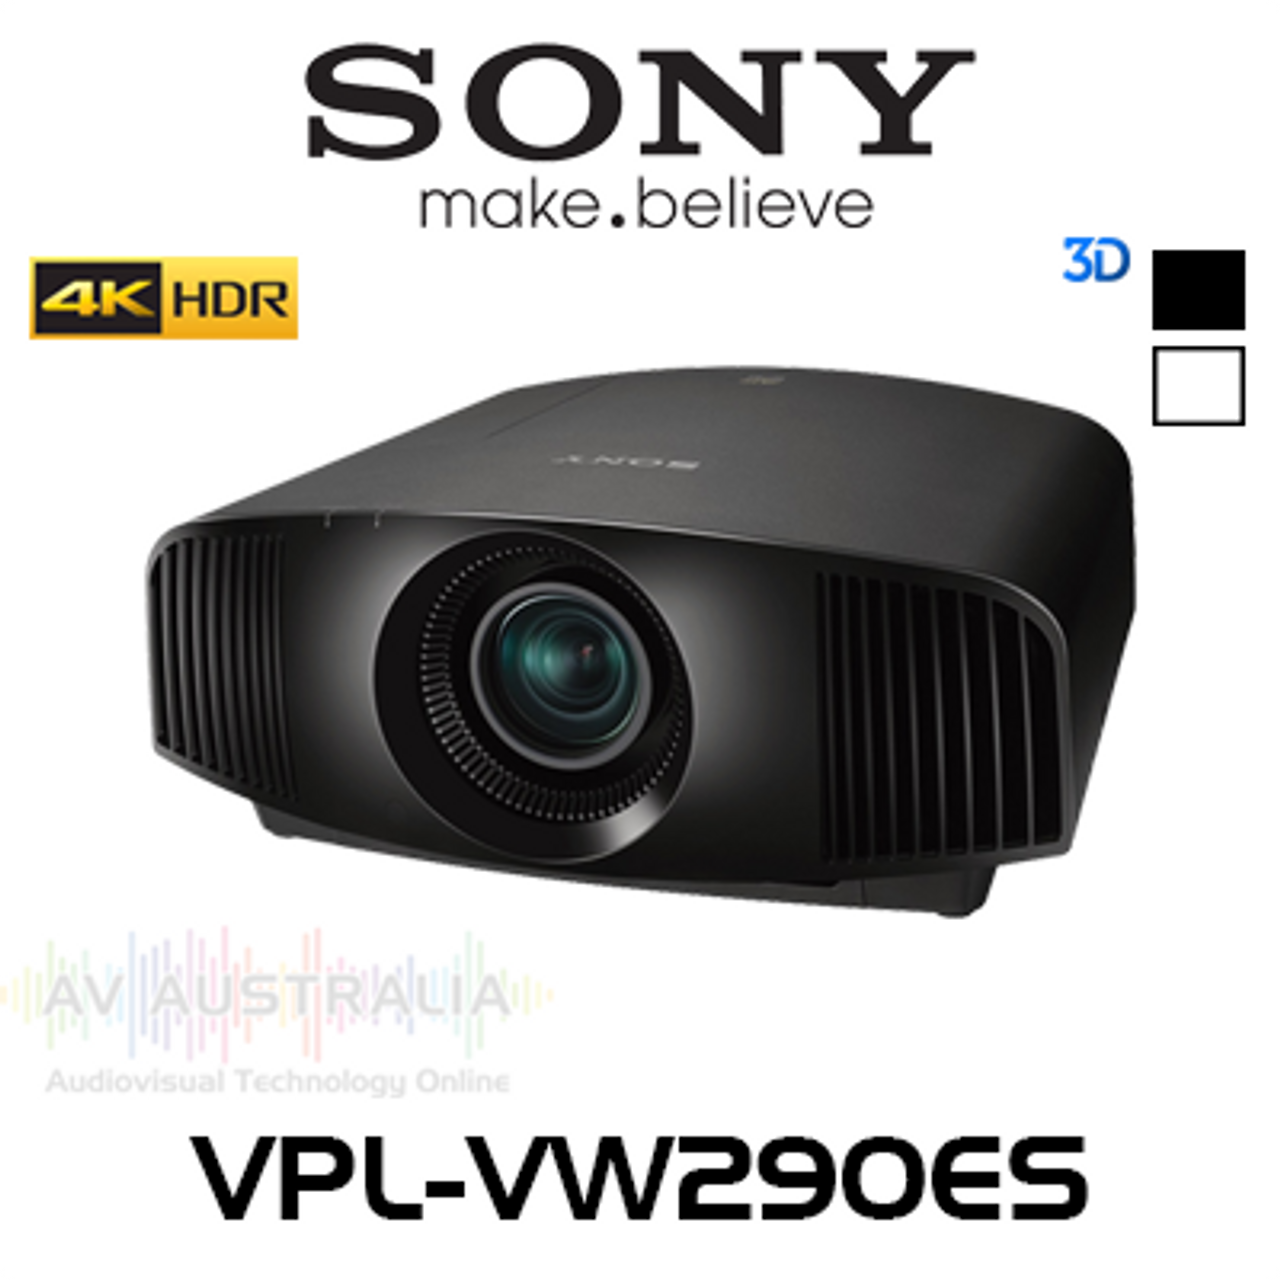 Sony VPL-VW290ES 4K HDR 1500 Lumens SXRD 3D Home Cinema Projector